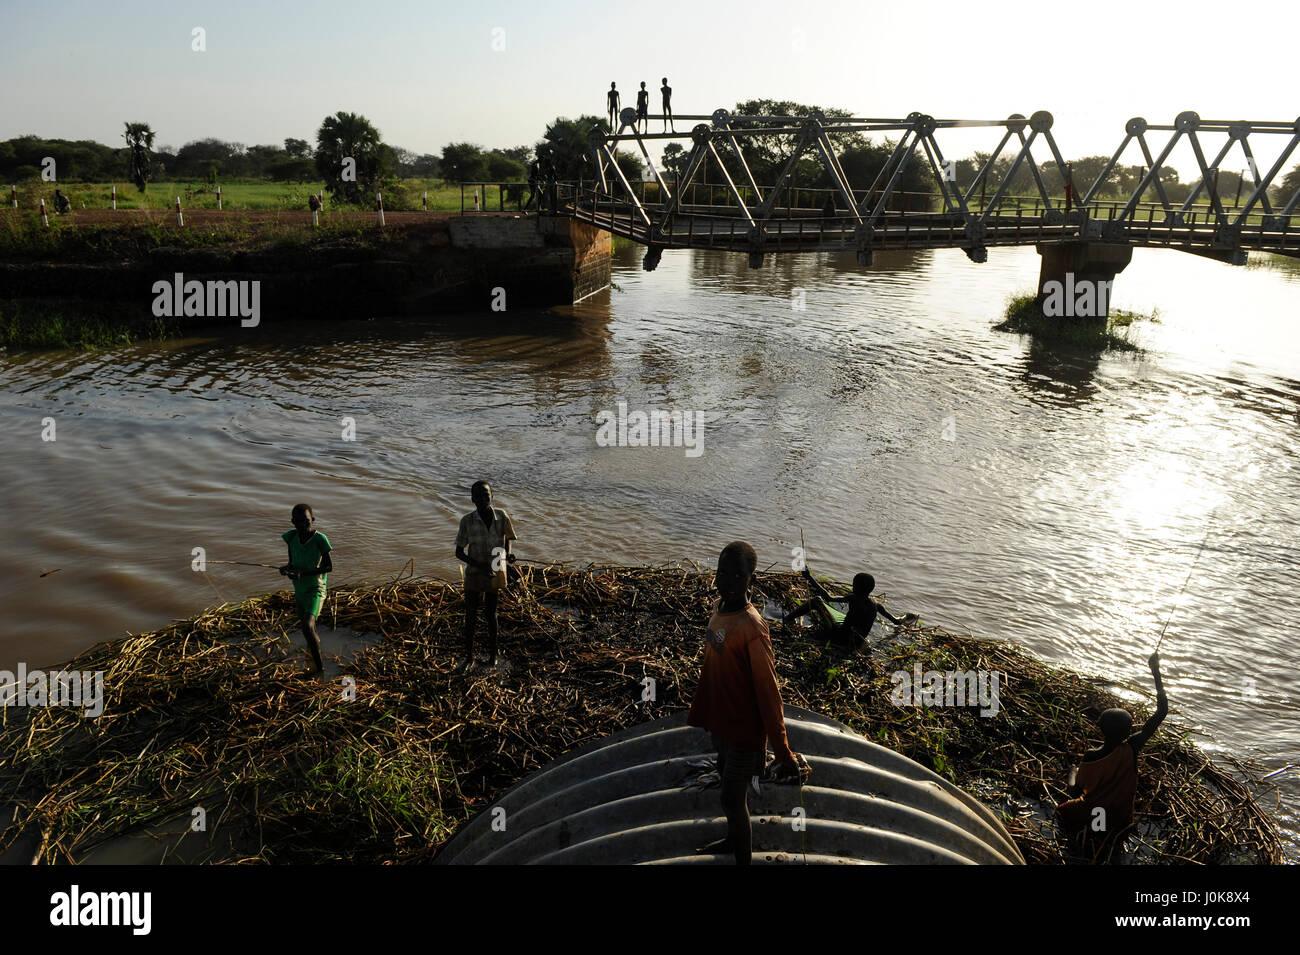 SOUTH SUDAN Lakes state, Rumbek, boys catching fish at Bamam bridge / SUED SUDAN, Junge angeln an der Bamam Bruecke - Stock Image